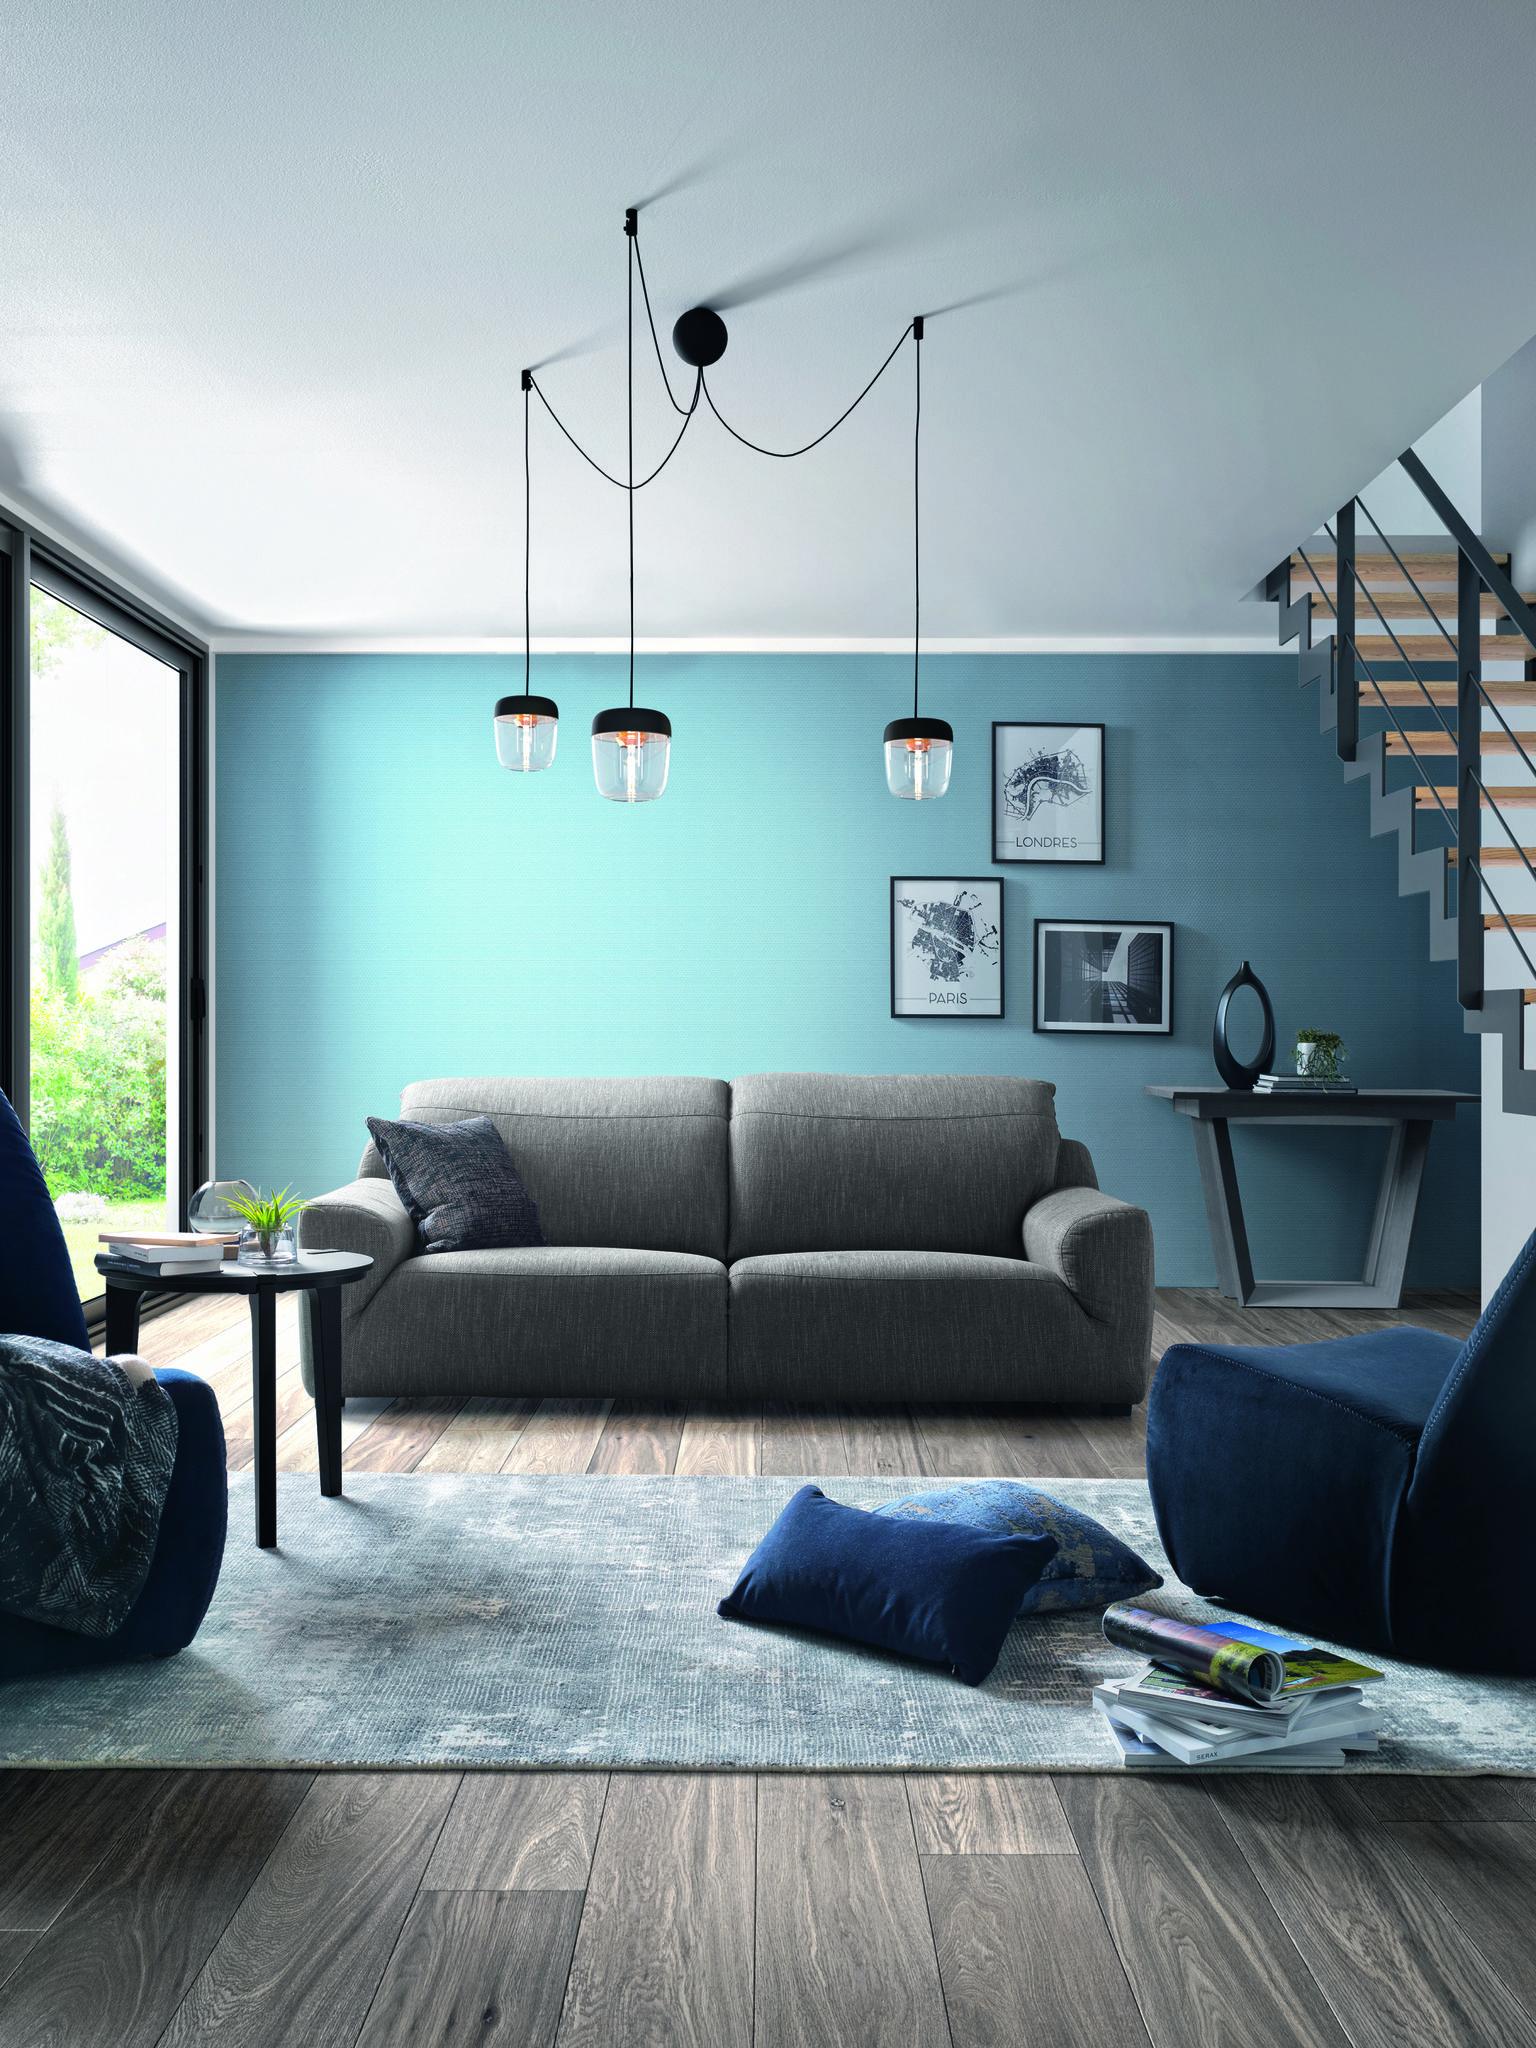 loft sofa collection interior wall colors hall design on interior wall colors id=81846